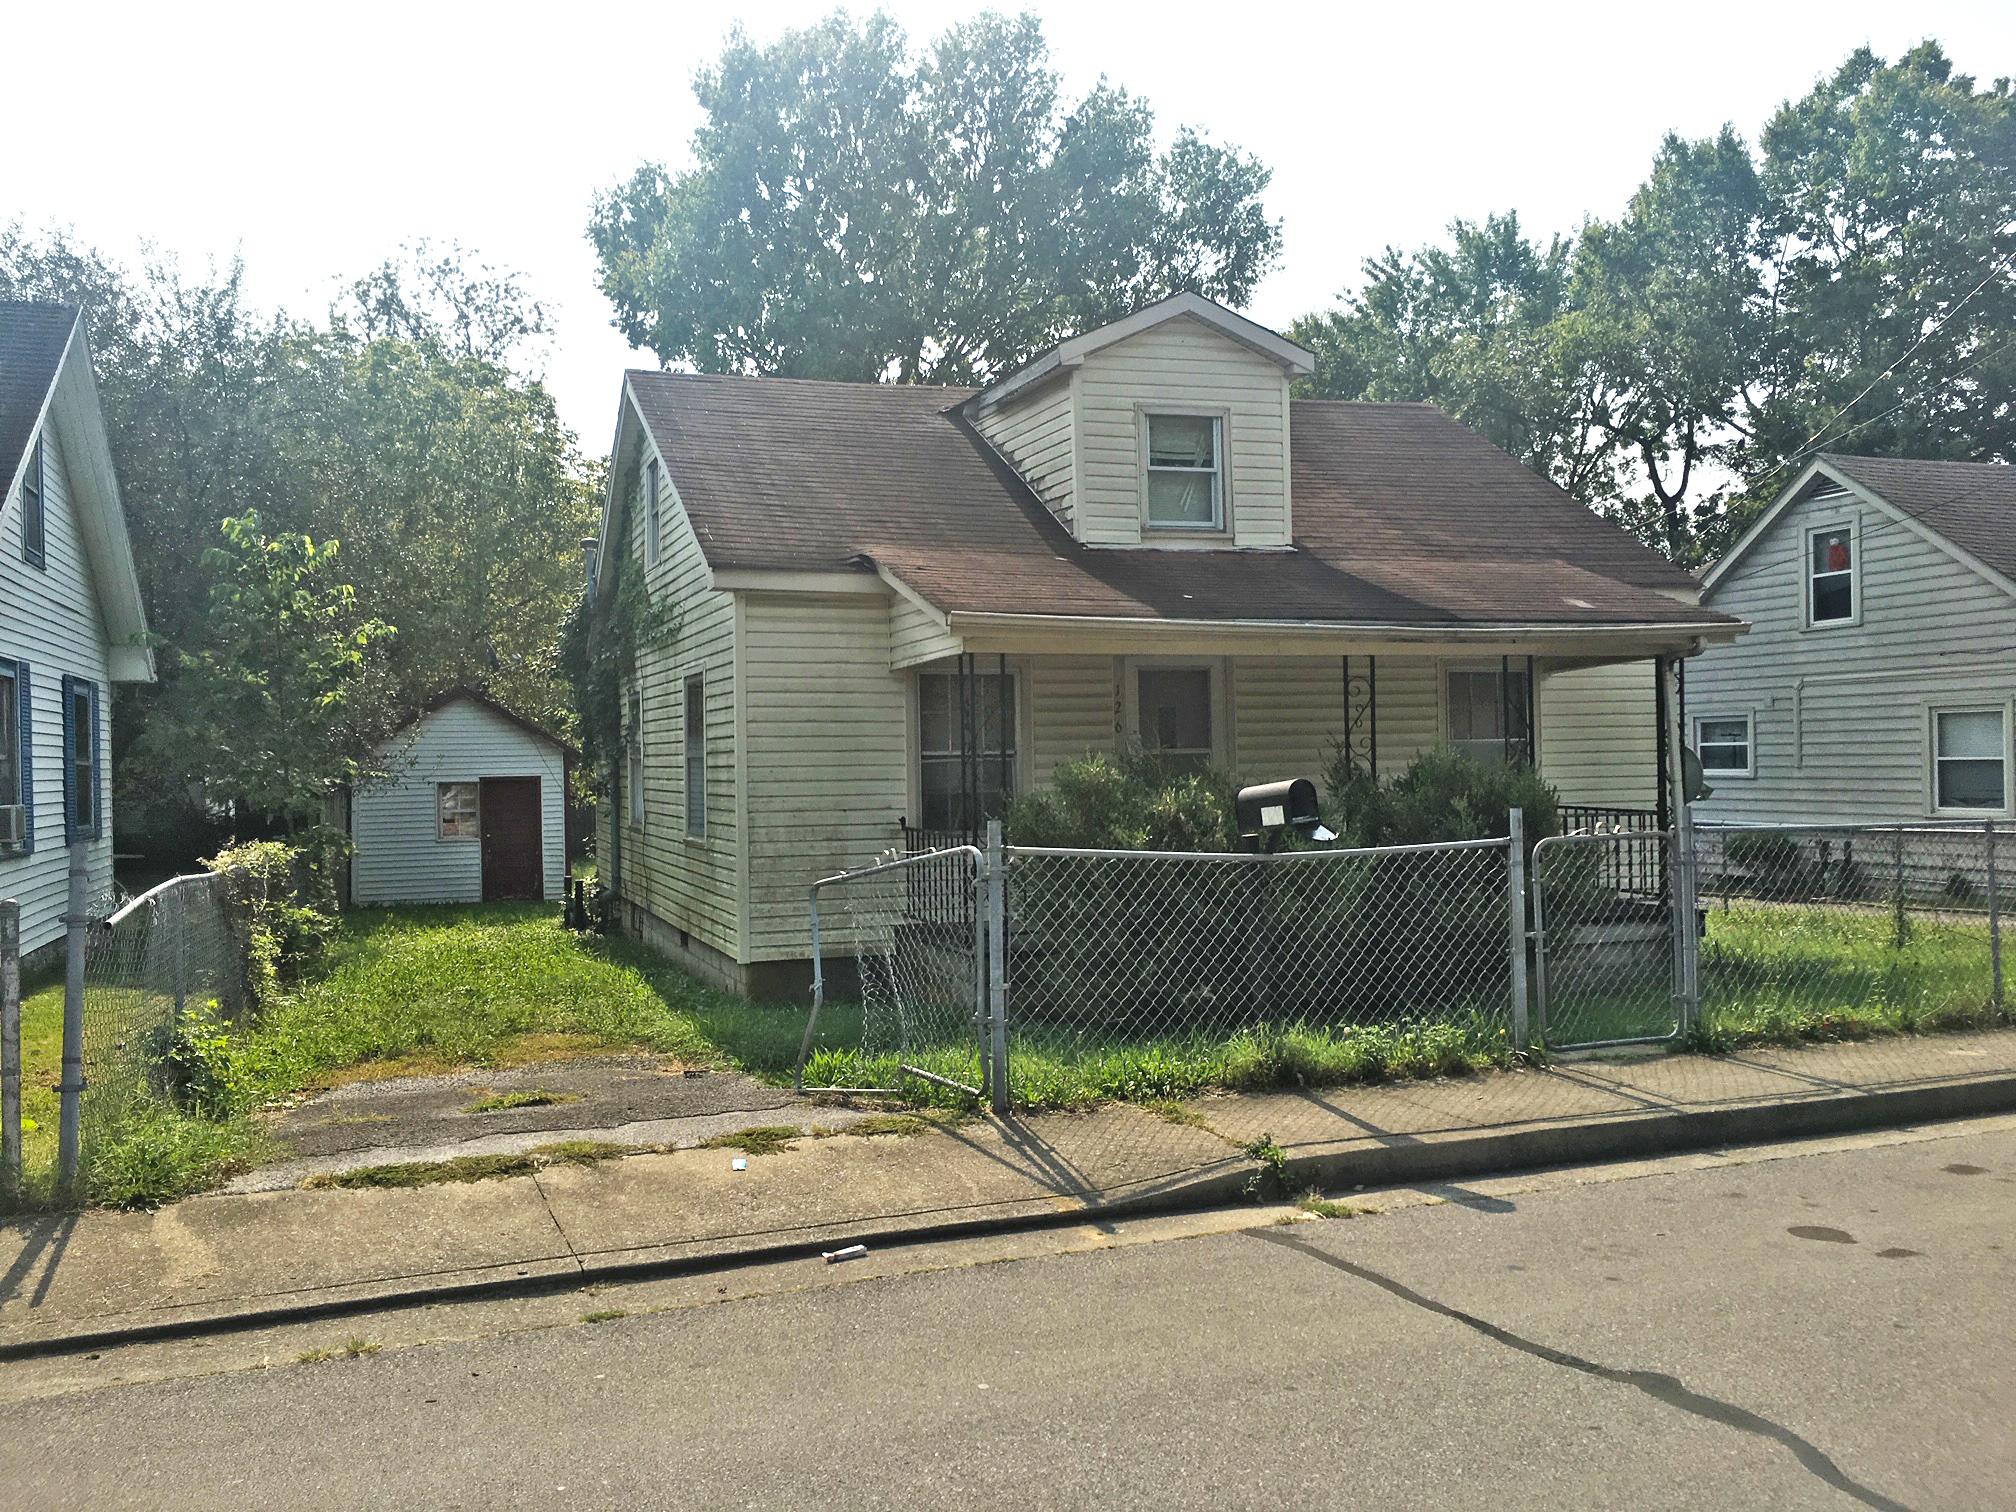 #1 - 126 Wilton Avenue - 17-CI-03711